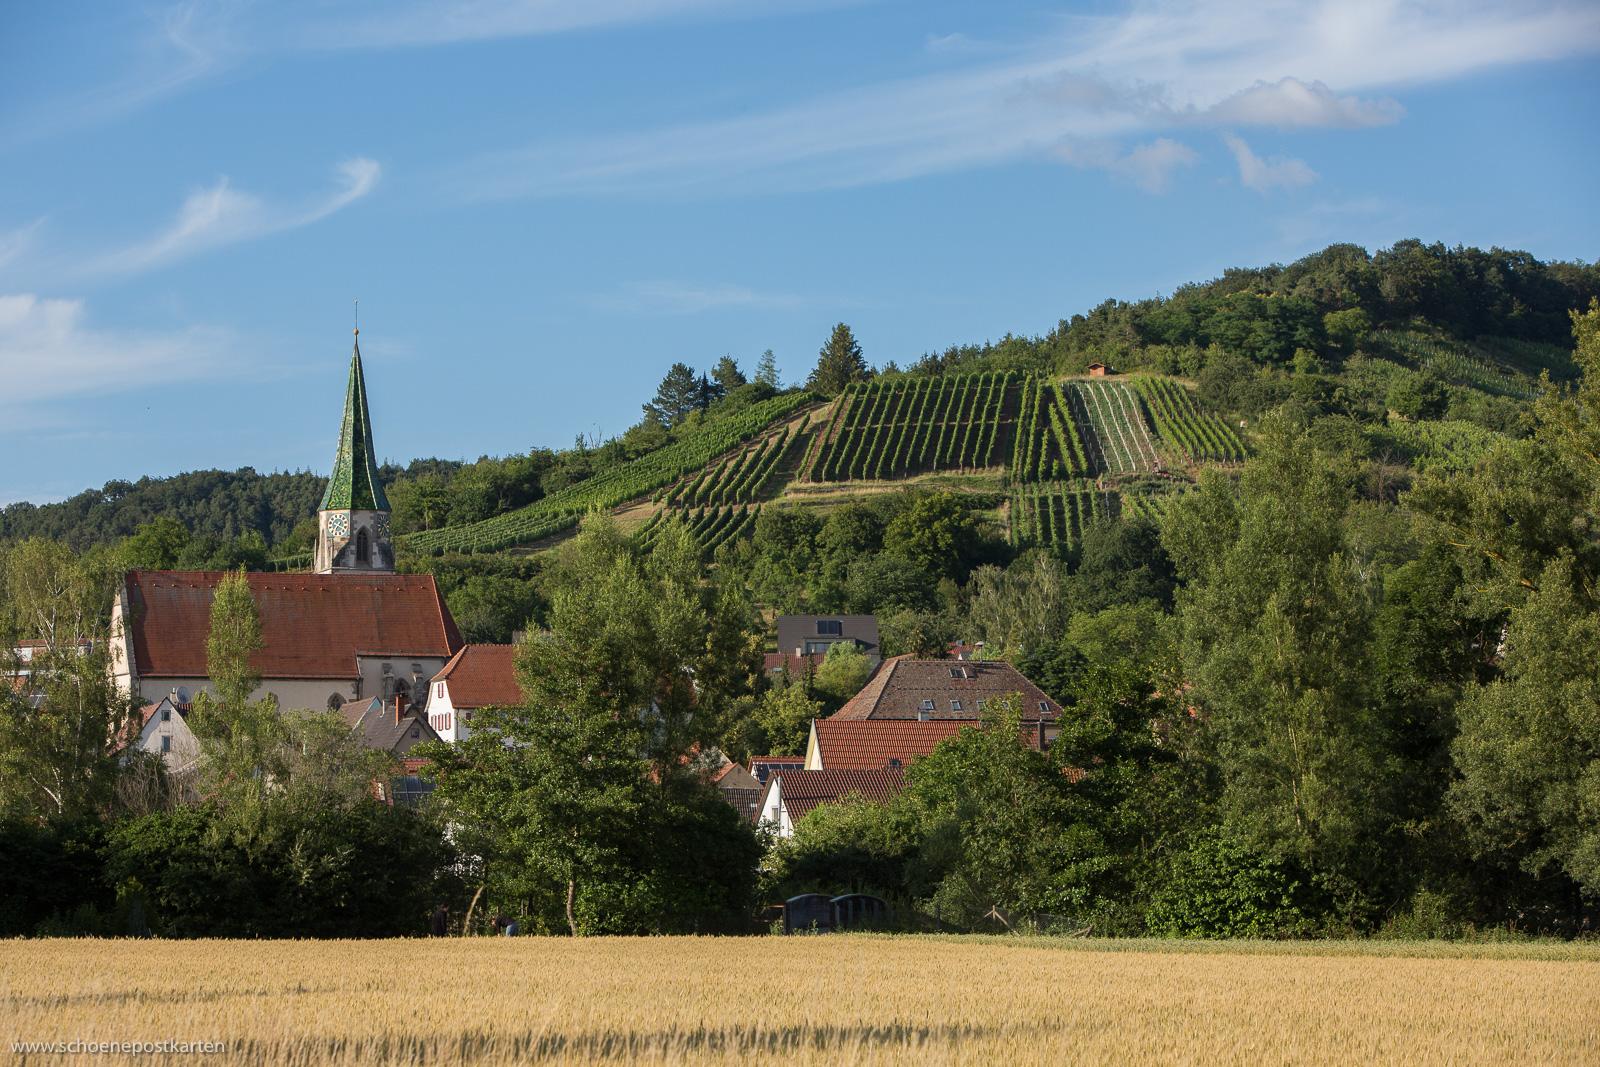 Spätgotische Pfarrkirche Sankt Barbara in Unterjesingen. Foto: www.schoenepostkarten.de